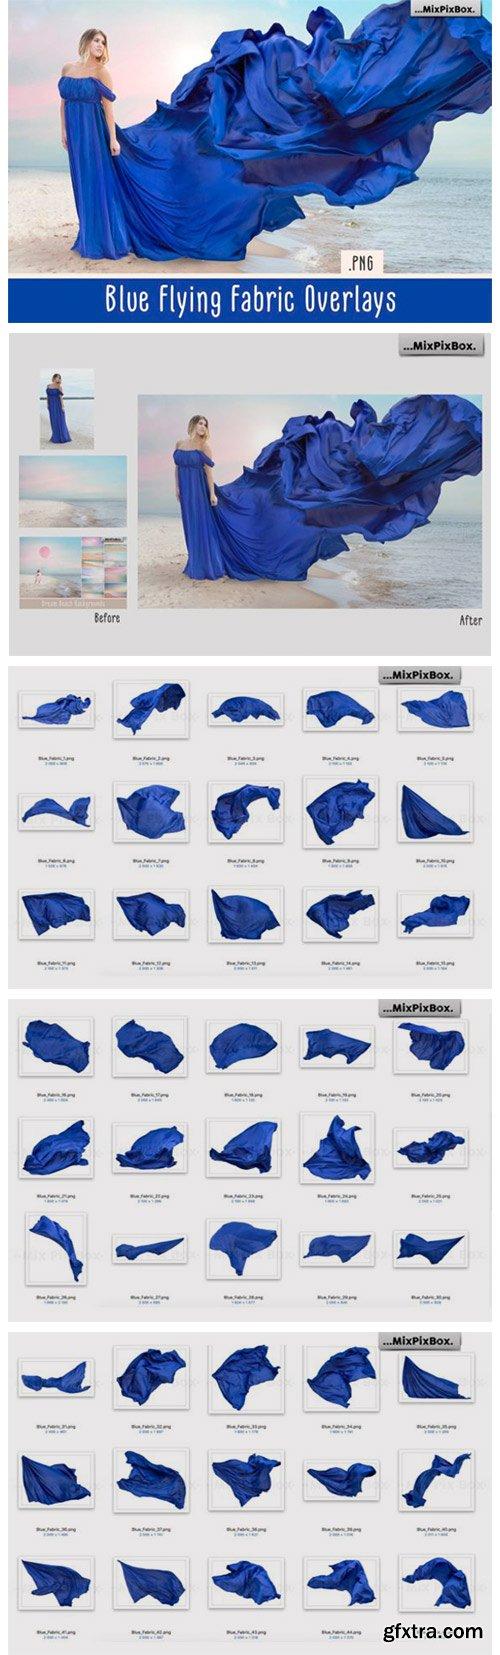 Blue Flying Fabric Overlays 4235920